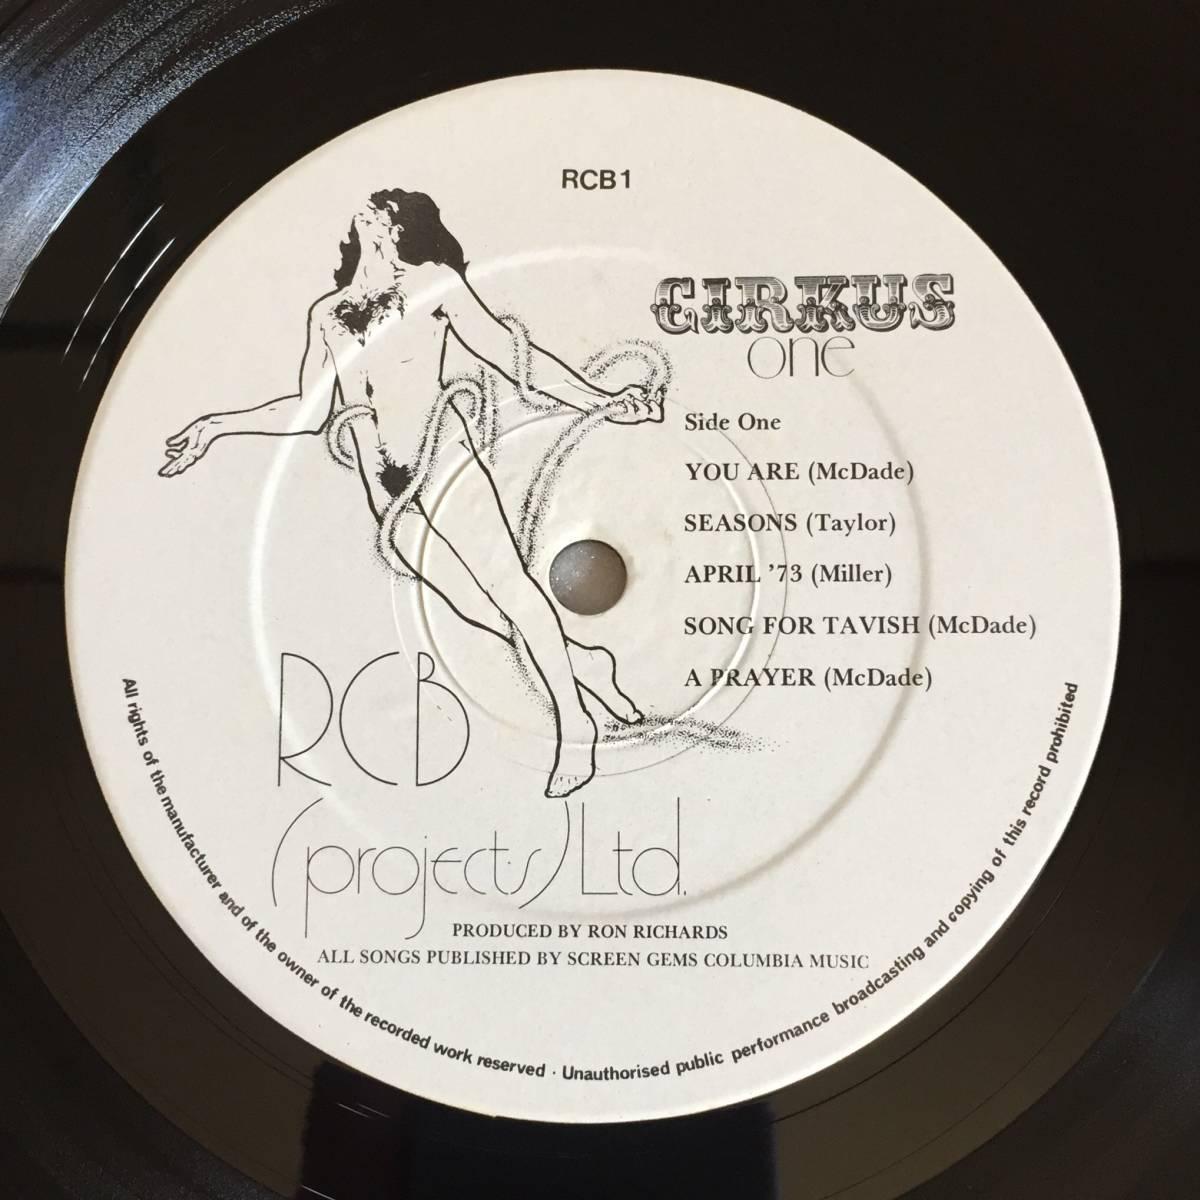 CIRKUS 「ONE」UK ORIGINAL RCB(PROJECTS)LTD. RCB 1 '73 UK MELLOTRON PROGRESSIVE ROCK 見開きジャケット_画像10